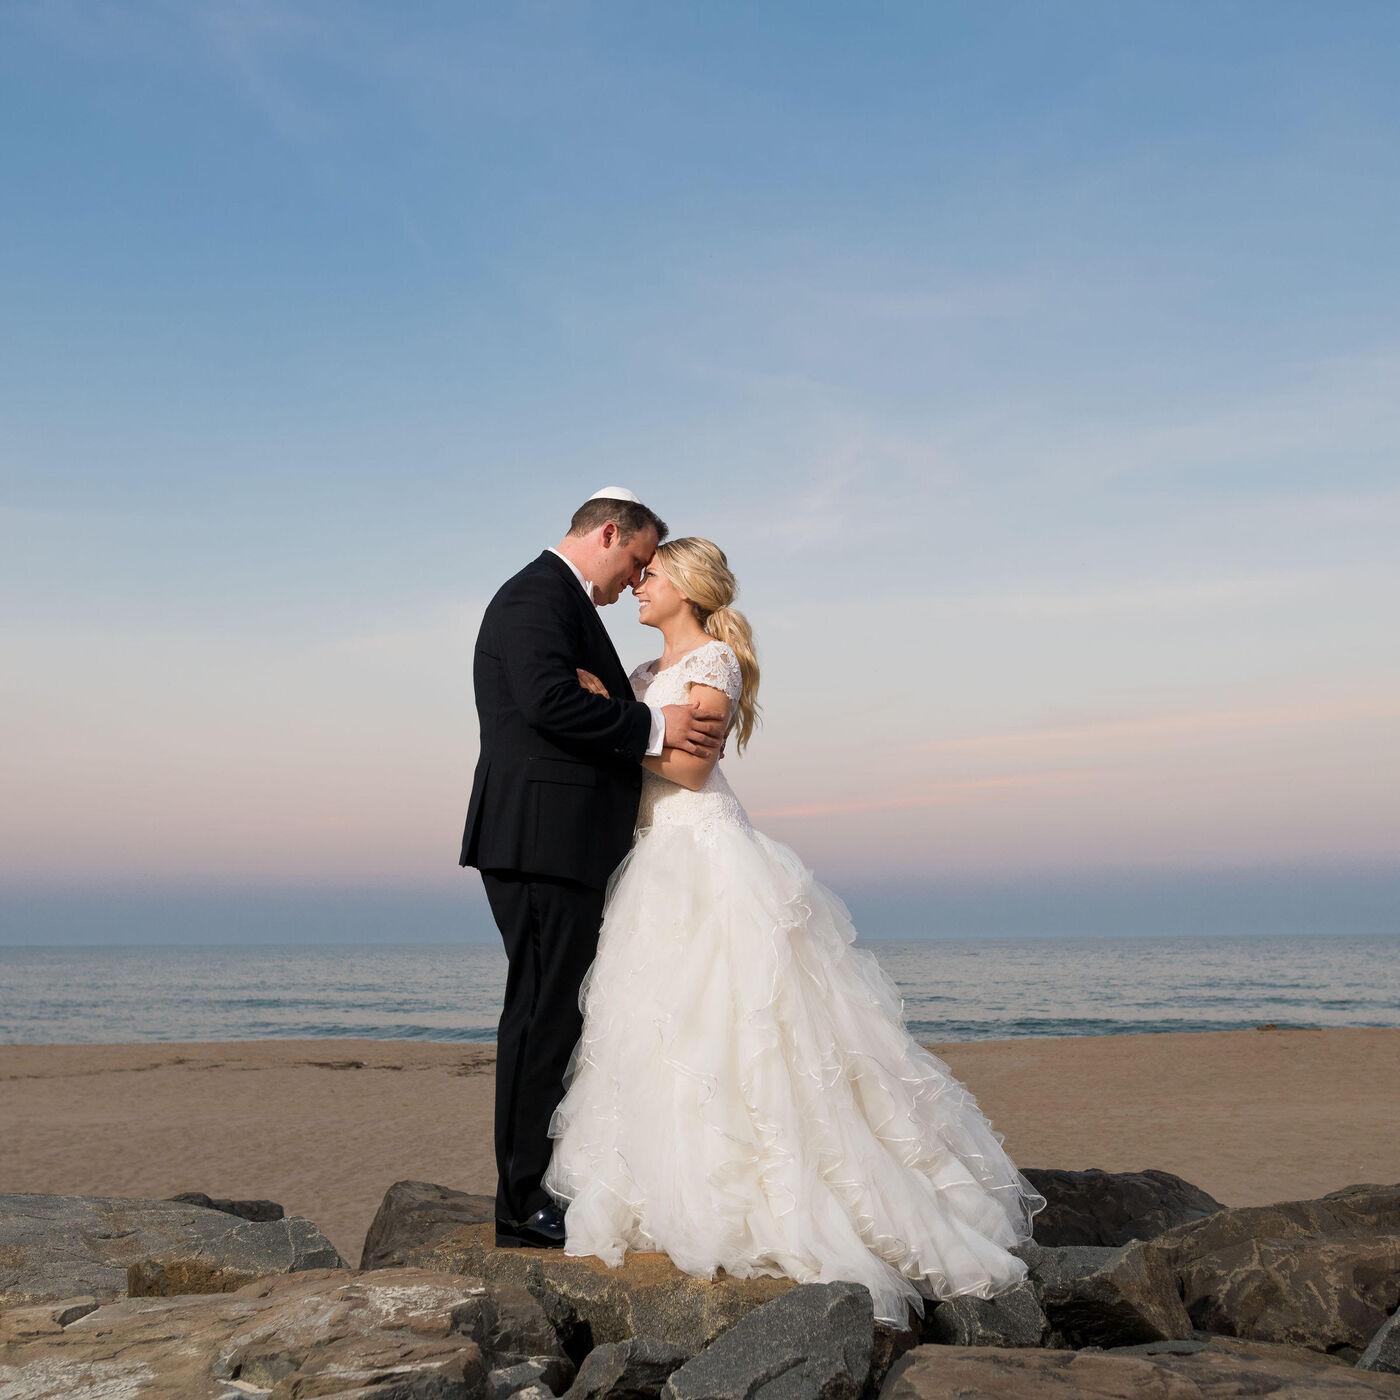 Benny and Sabrina- A Beachside Wedding After All